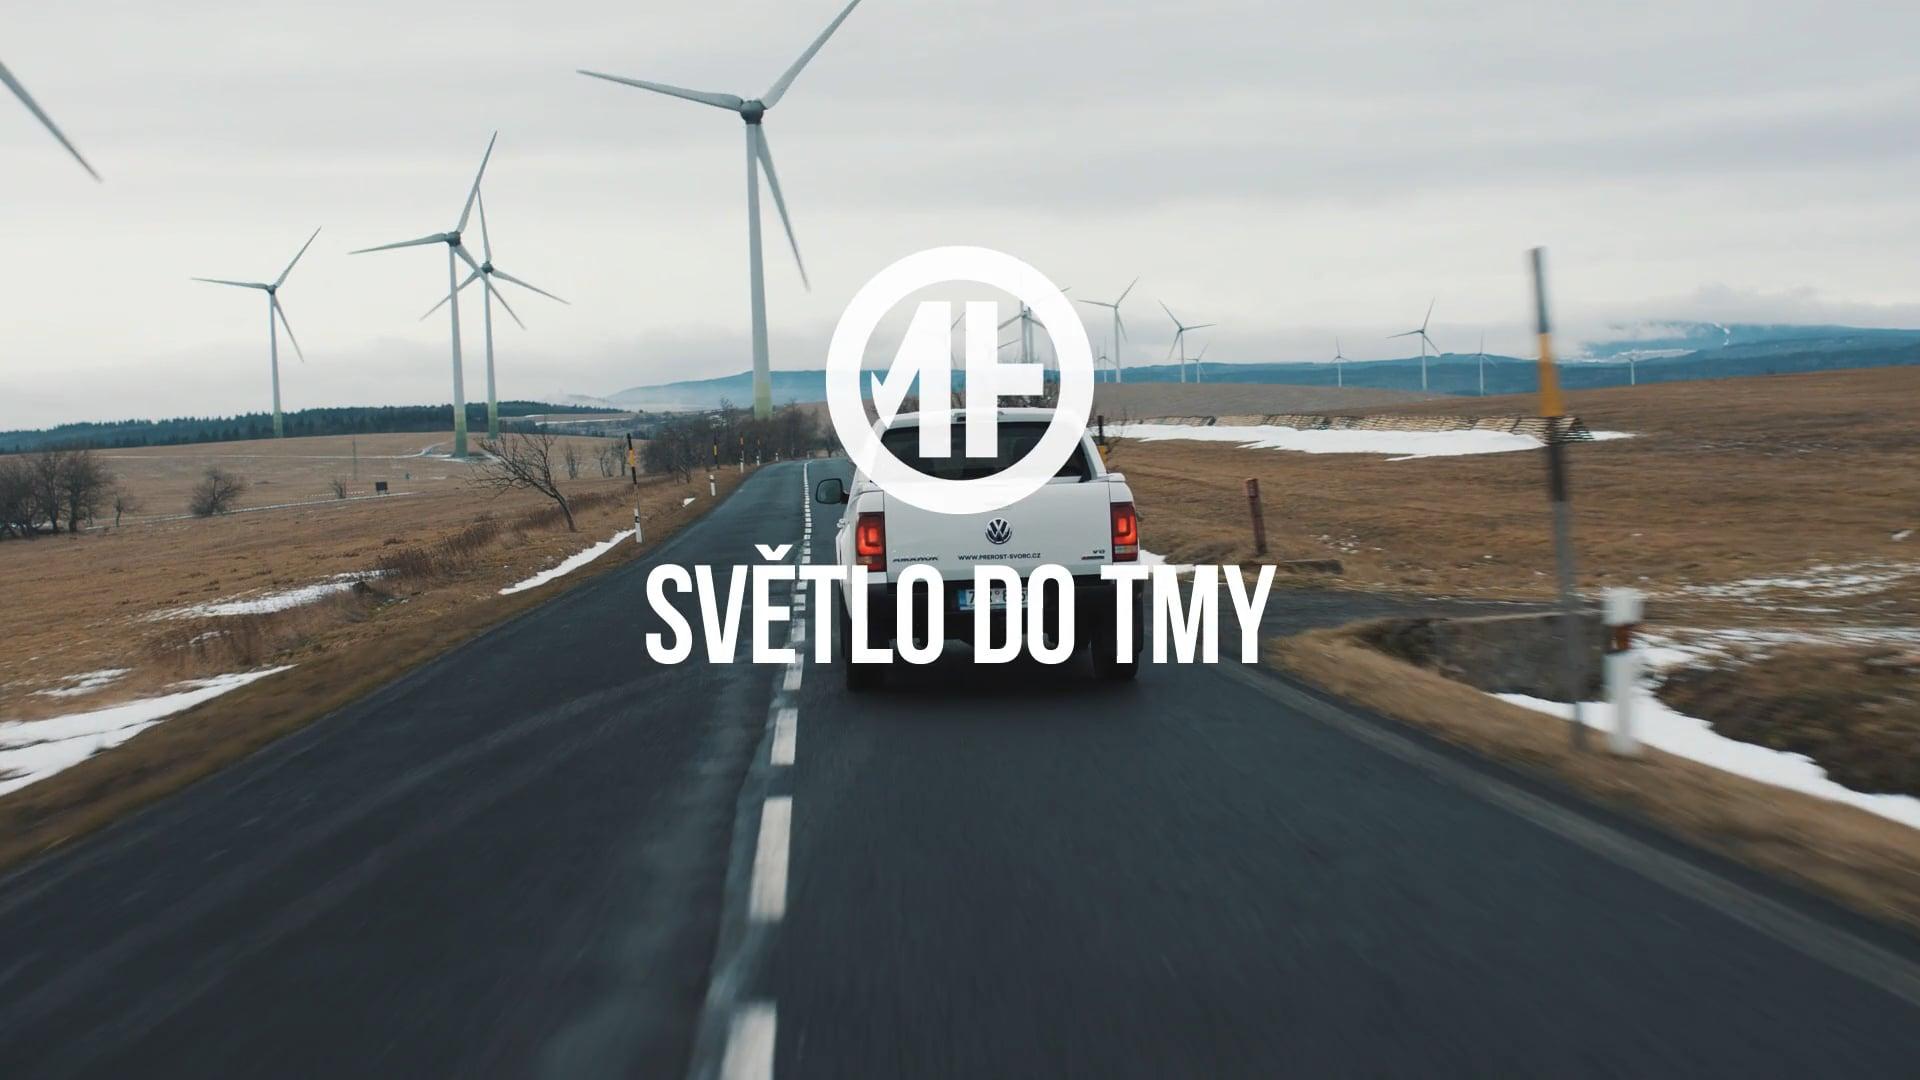 MICHAL HRUZA / SVETLO DO TMY